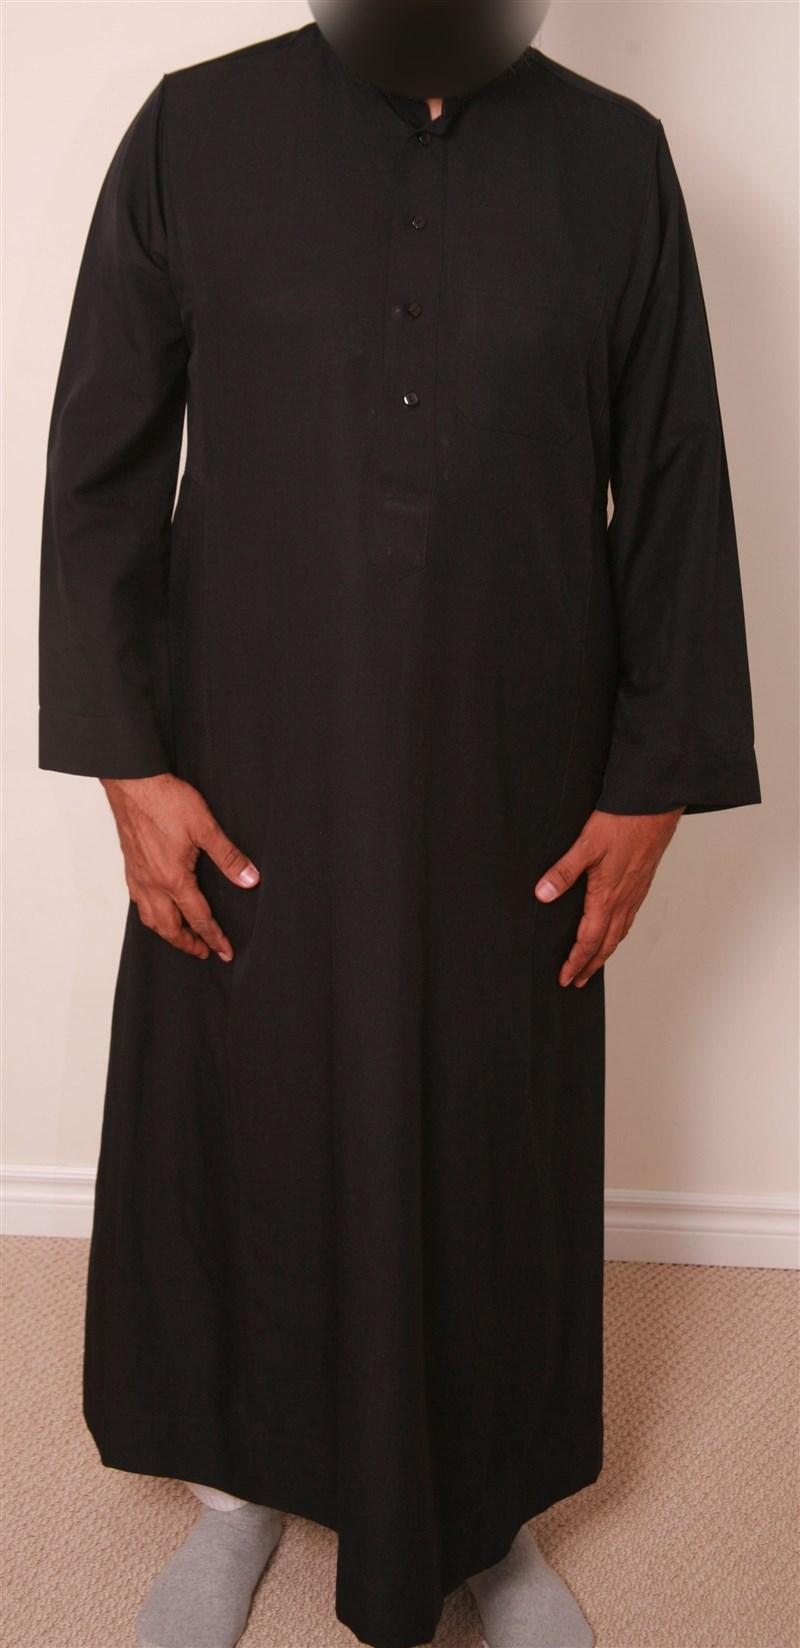 Al Harmain Jubba Thobe Winter The Sunnah Solutions Clothing